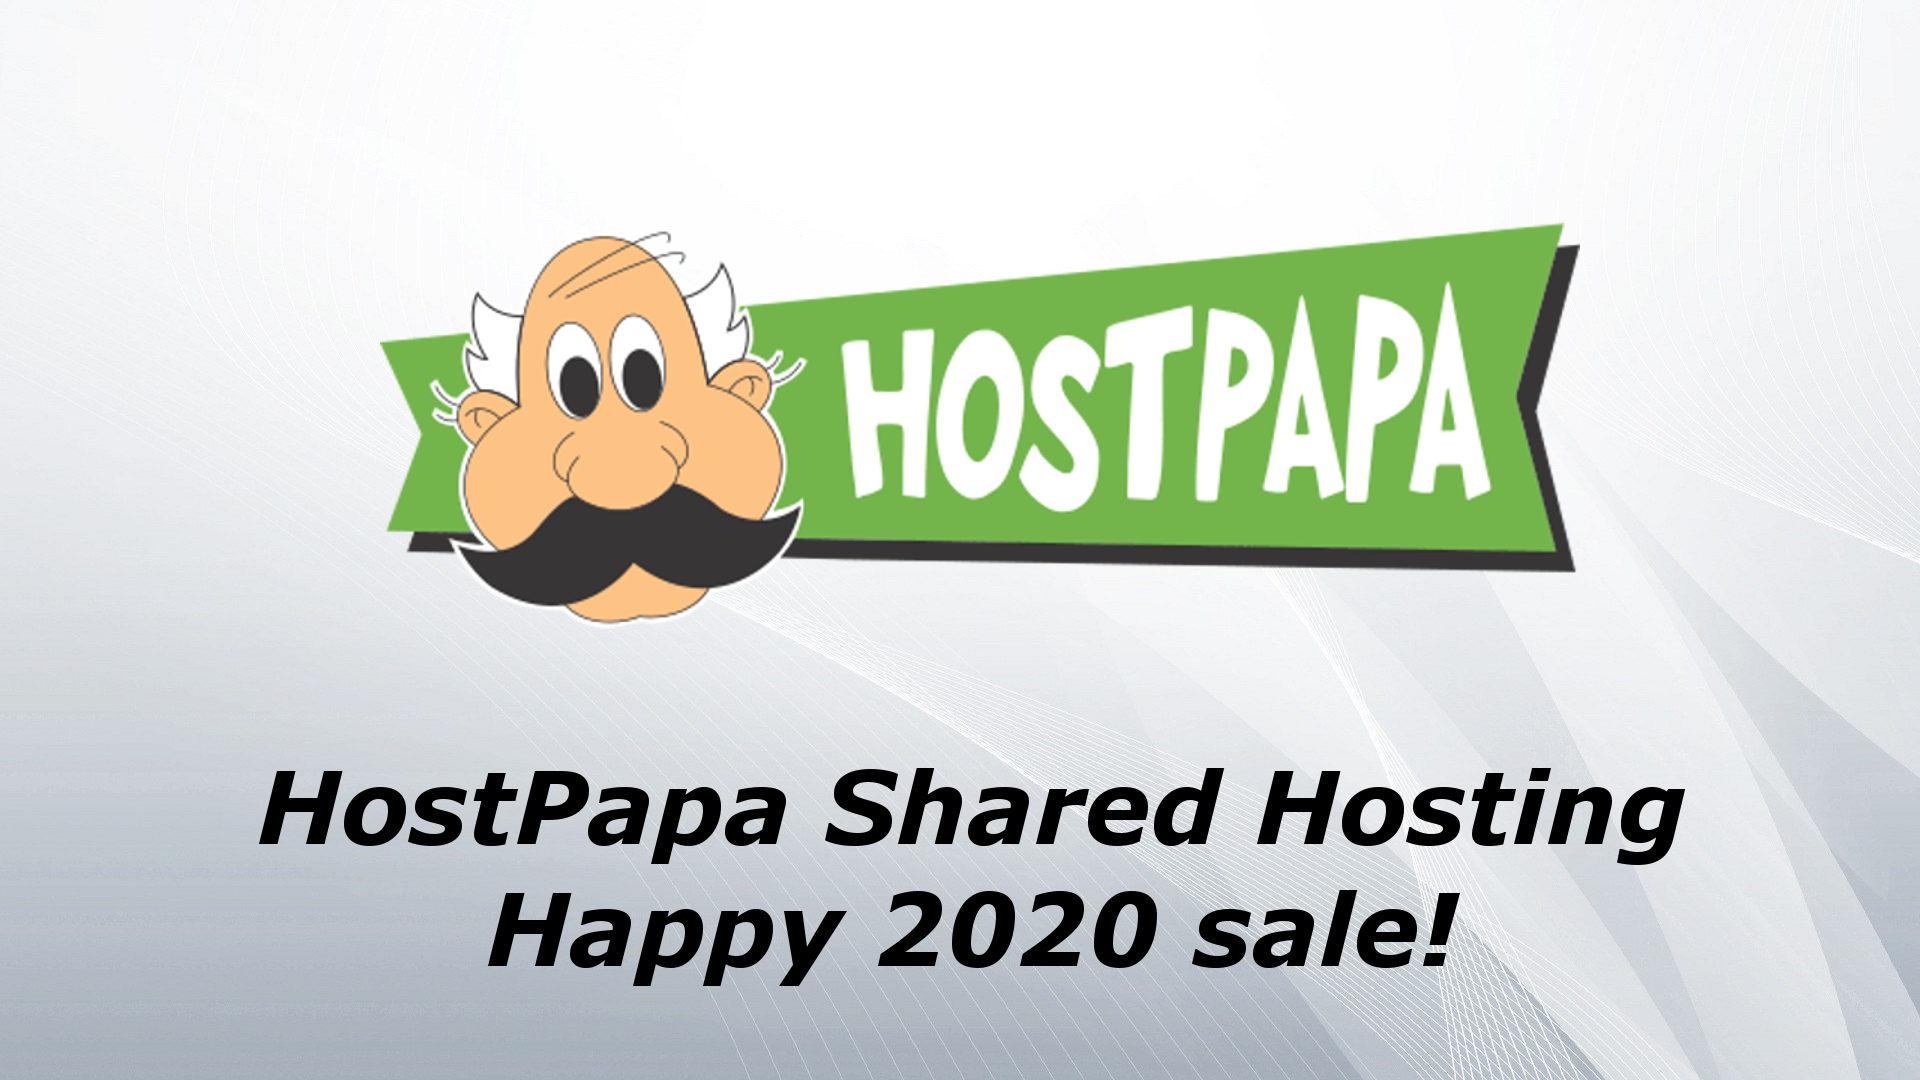 hostpapa-2020-sale